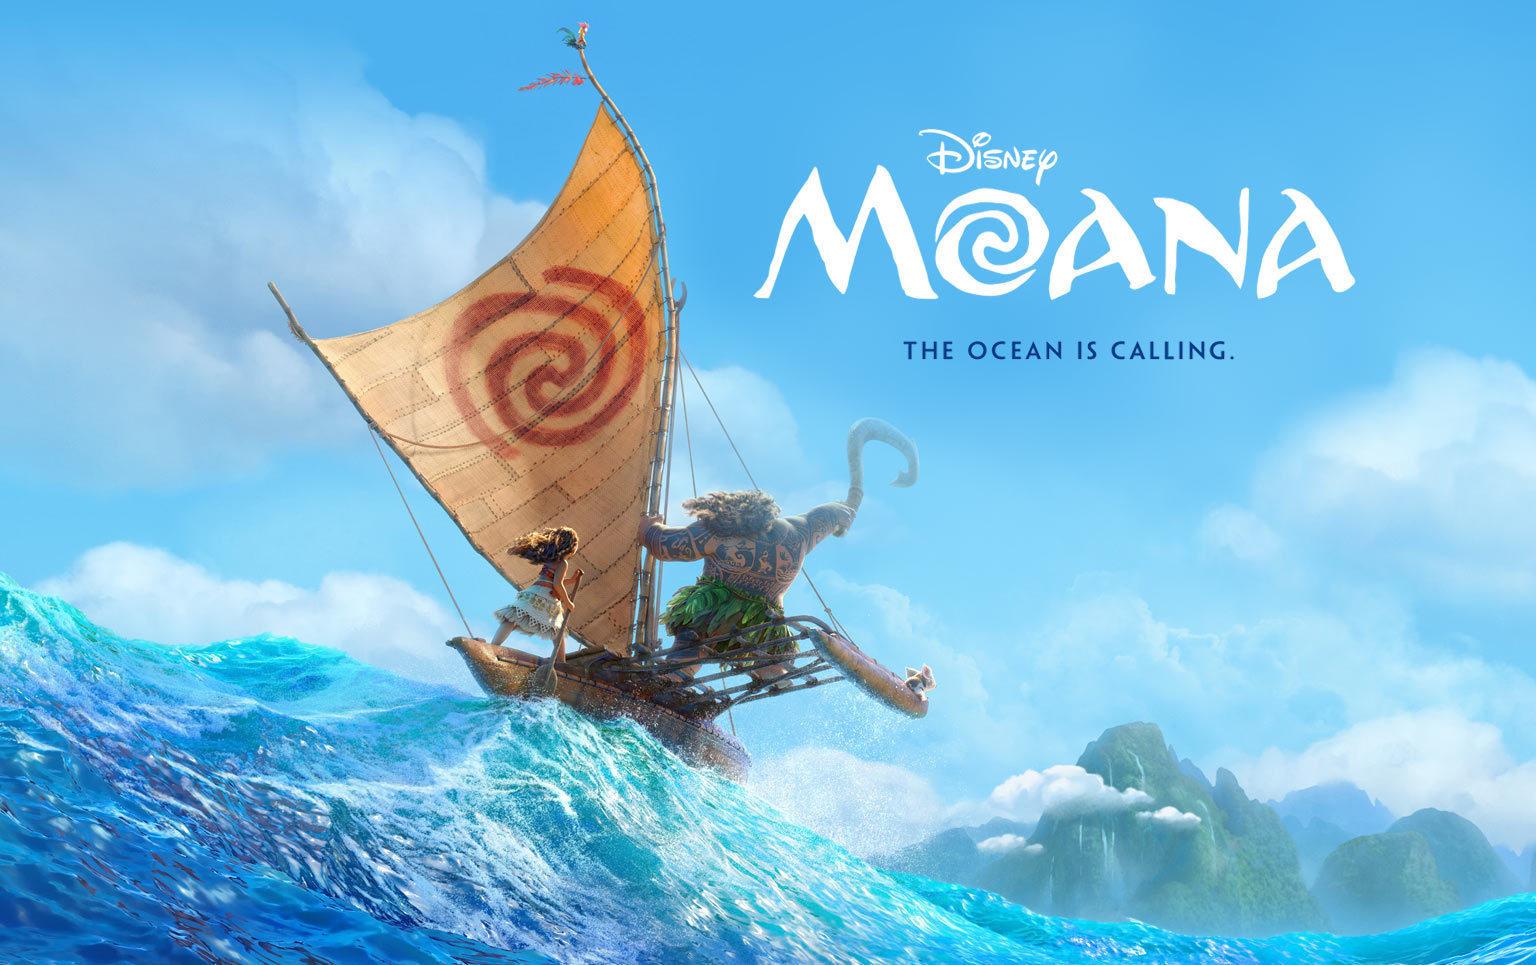 Pig emoji coloring pages printable - Moana Disney Movies